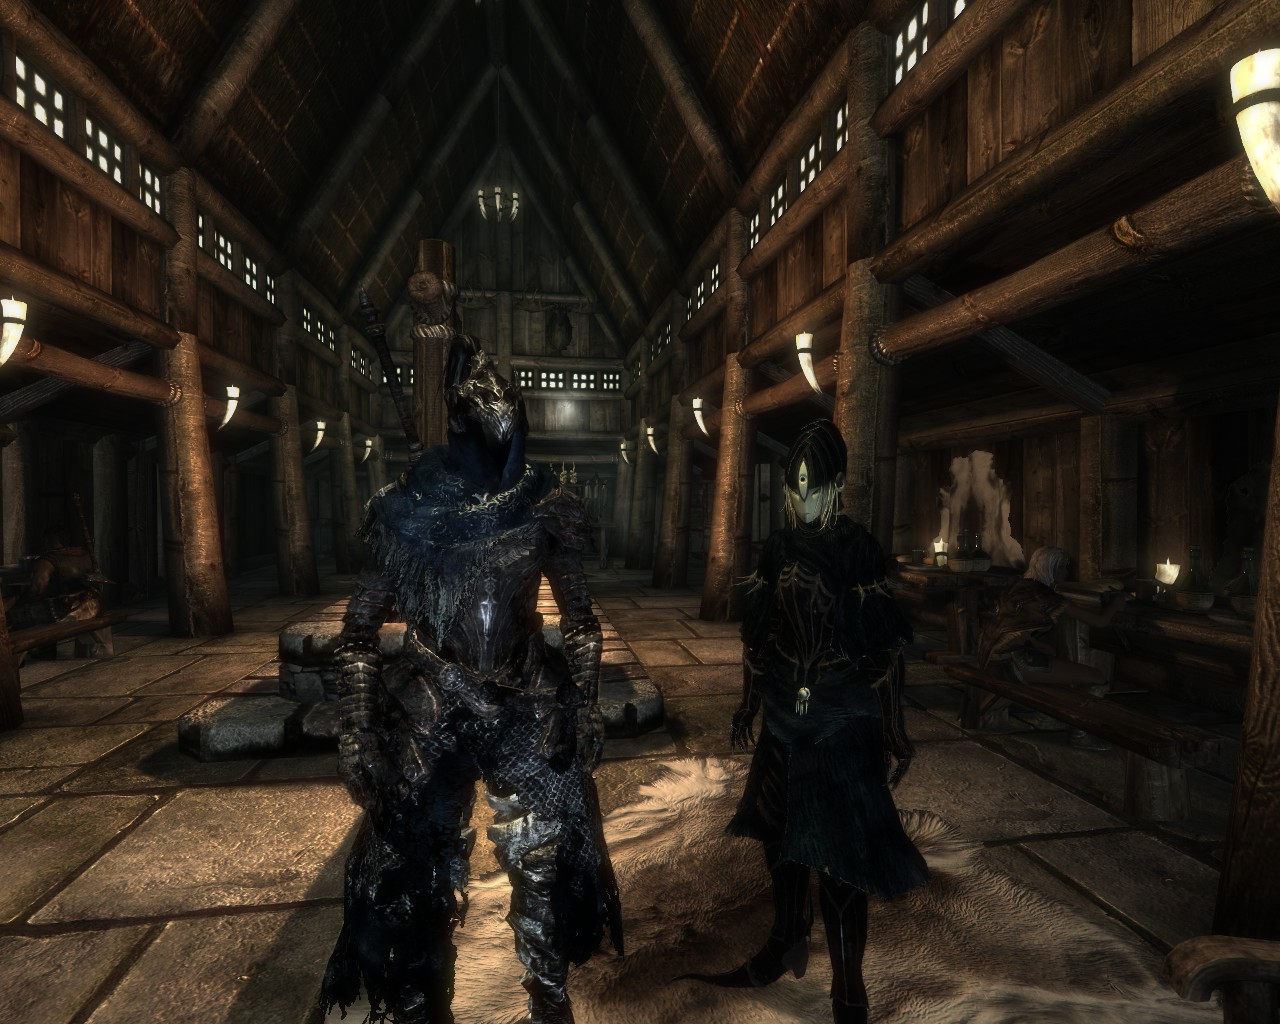 Skyrim Dark Souls by dxcon619 on DeviantArt